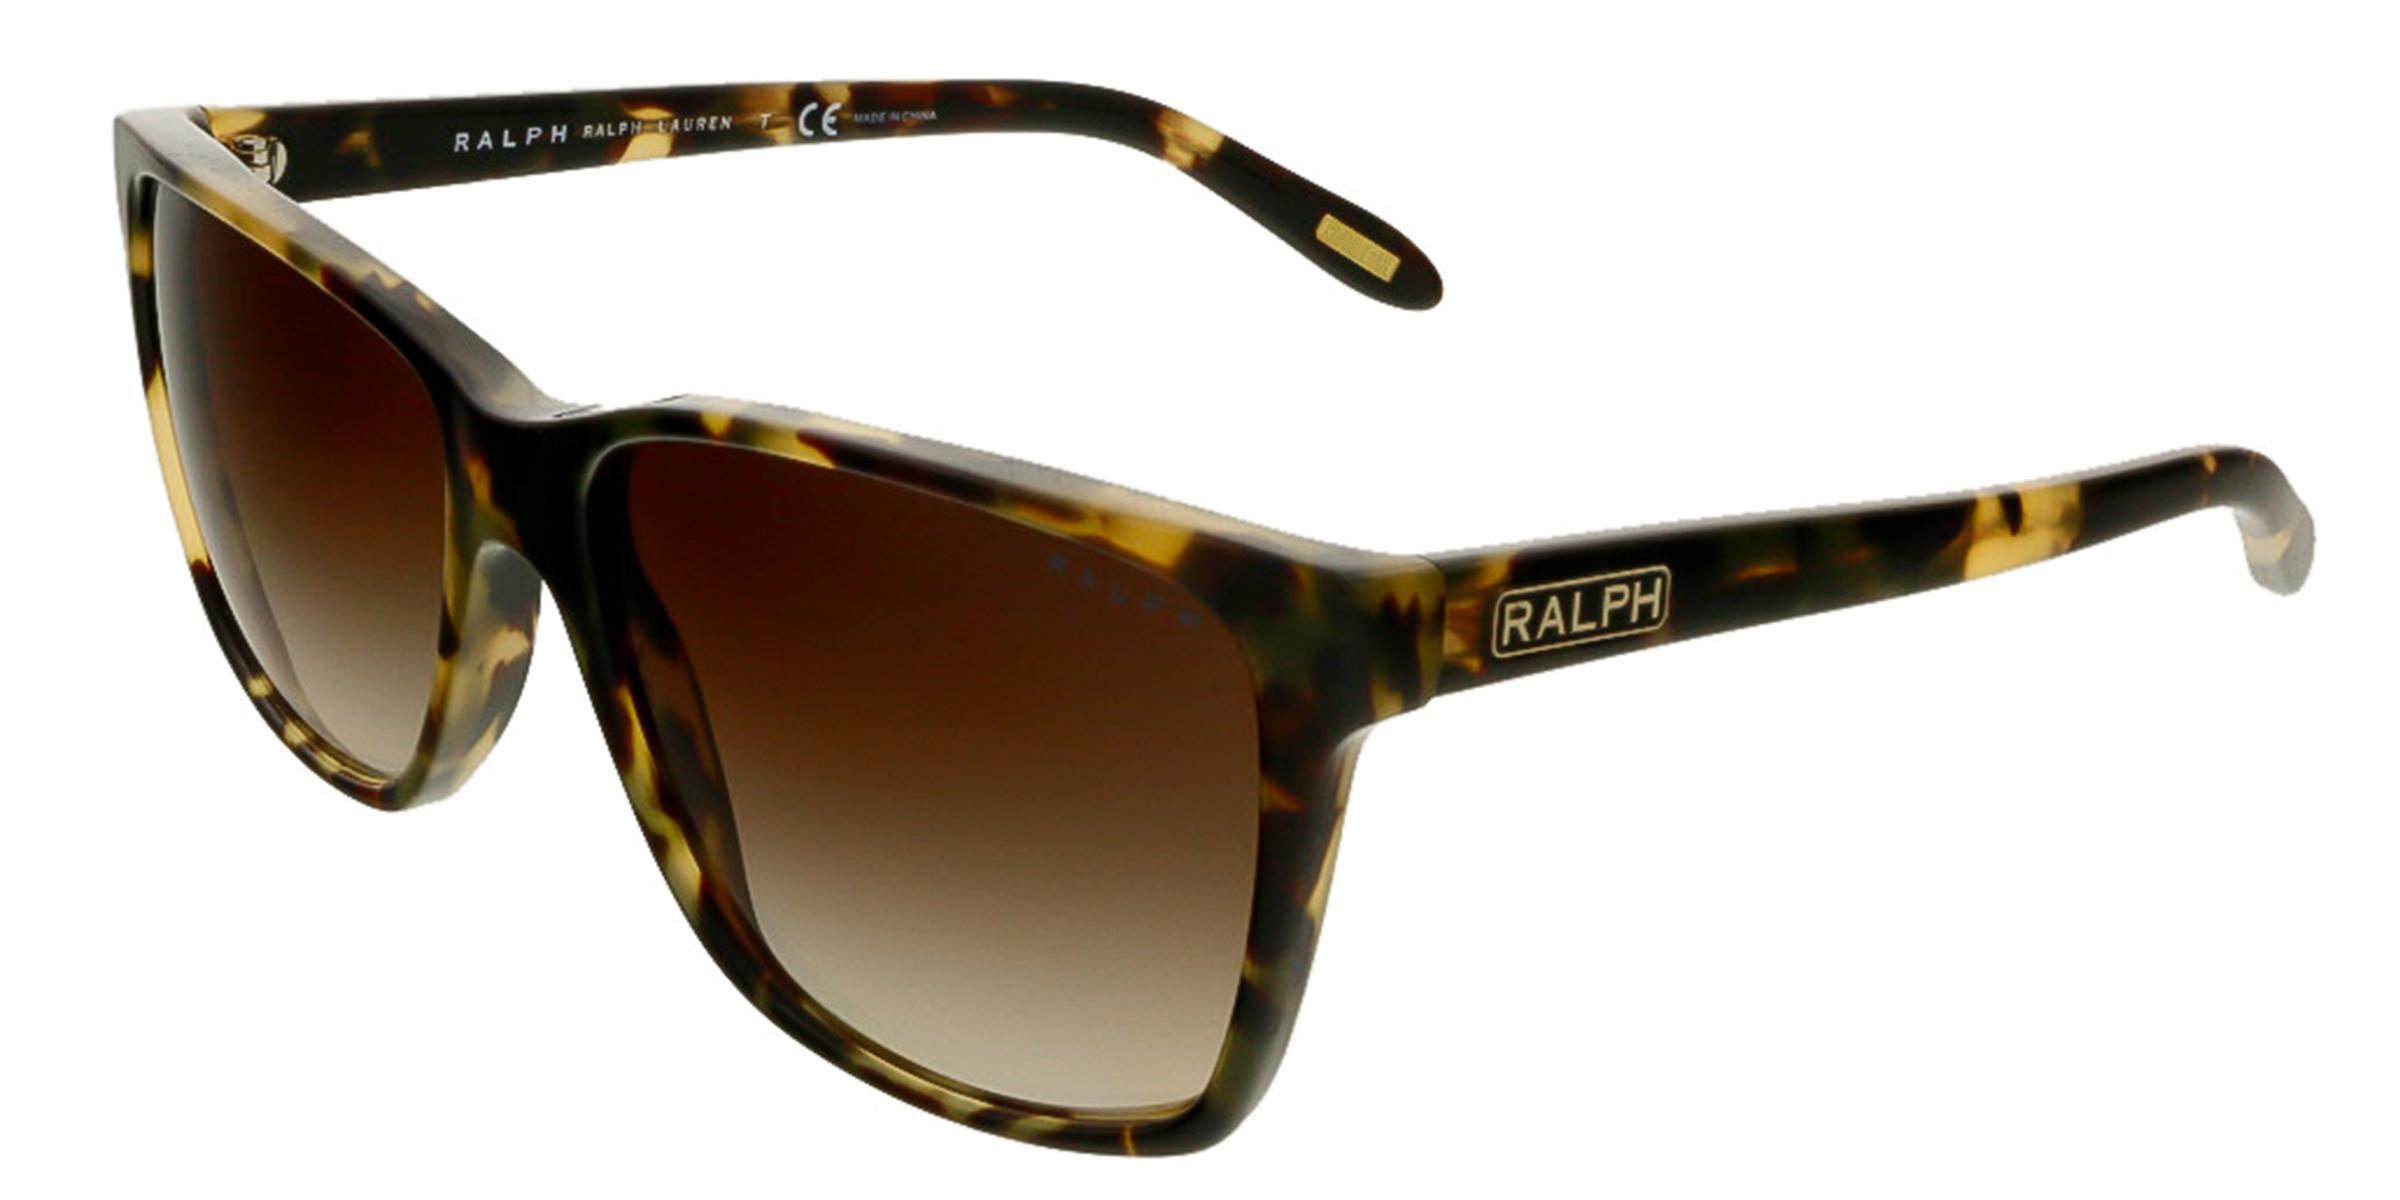 Ralph Lauren RA5141 905/13 Vintage Tortoise Wayfarer Sunglasses